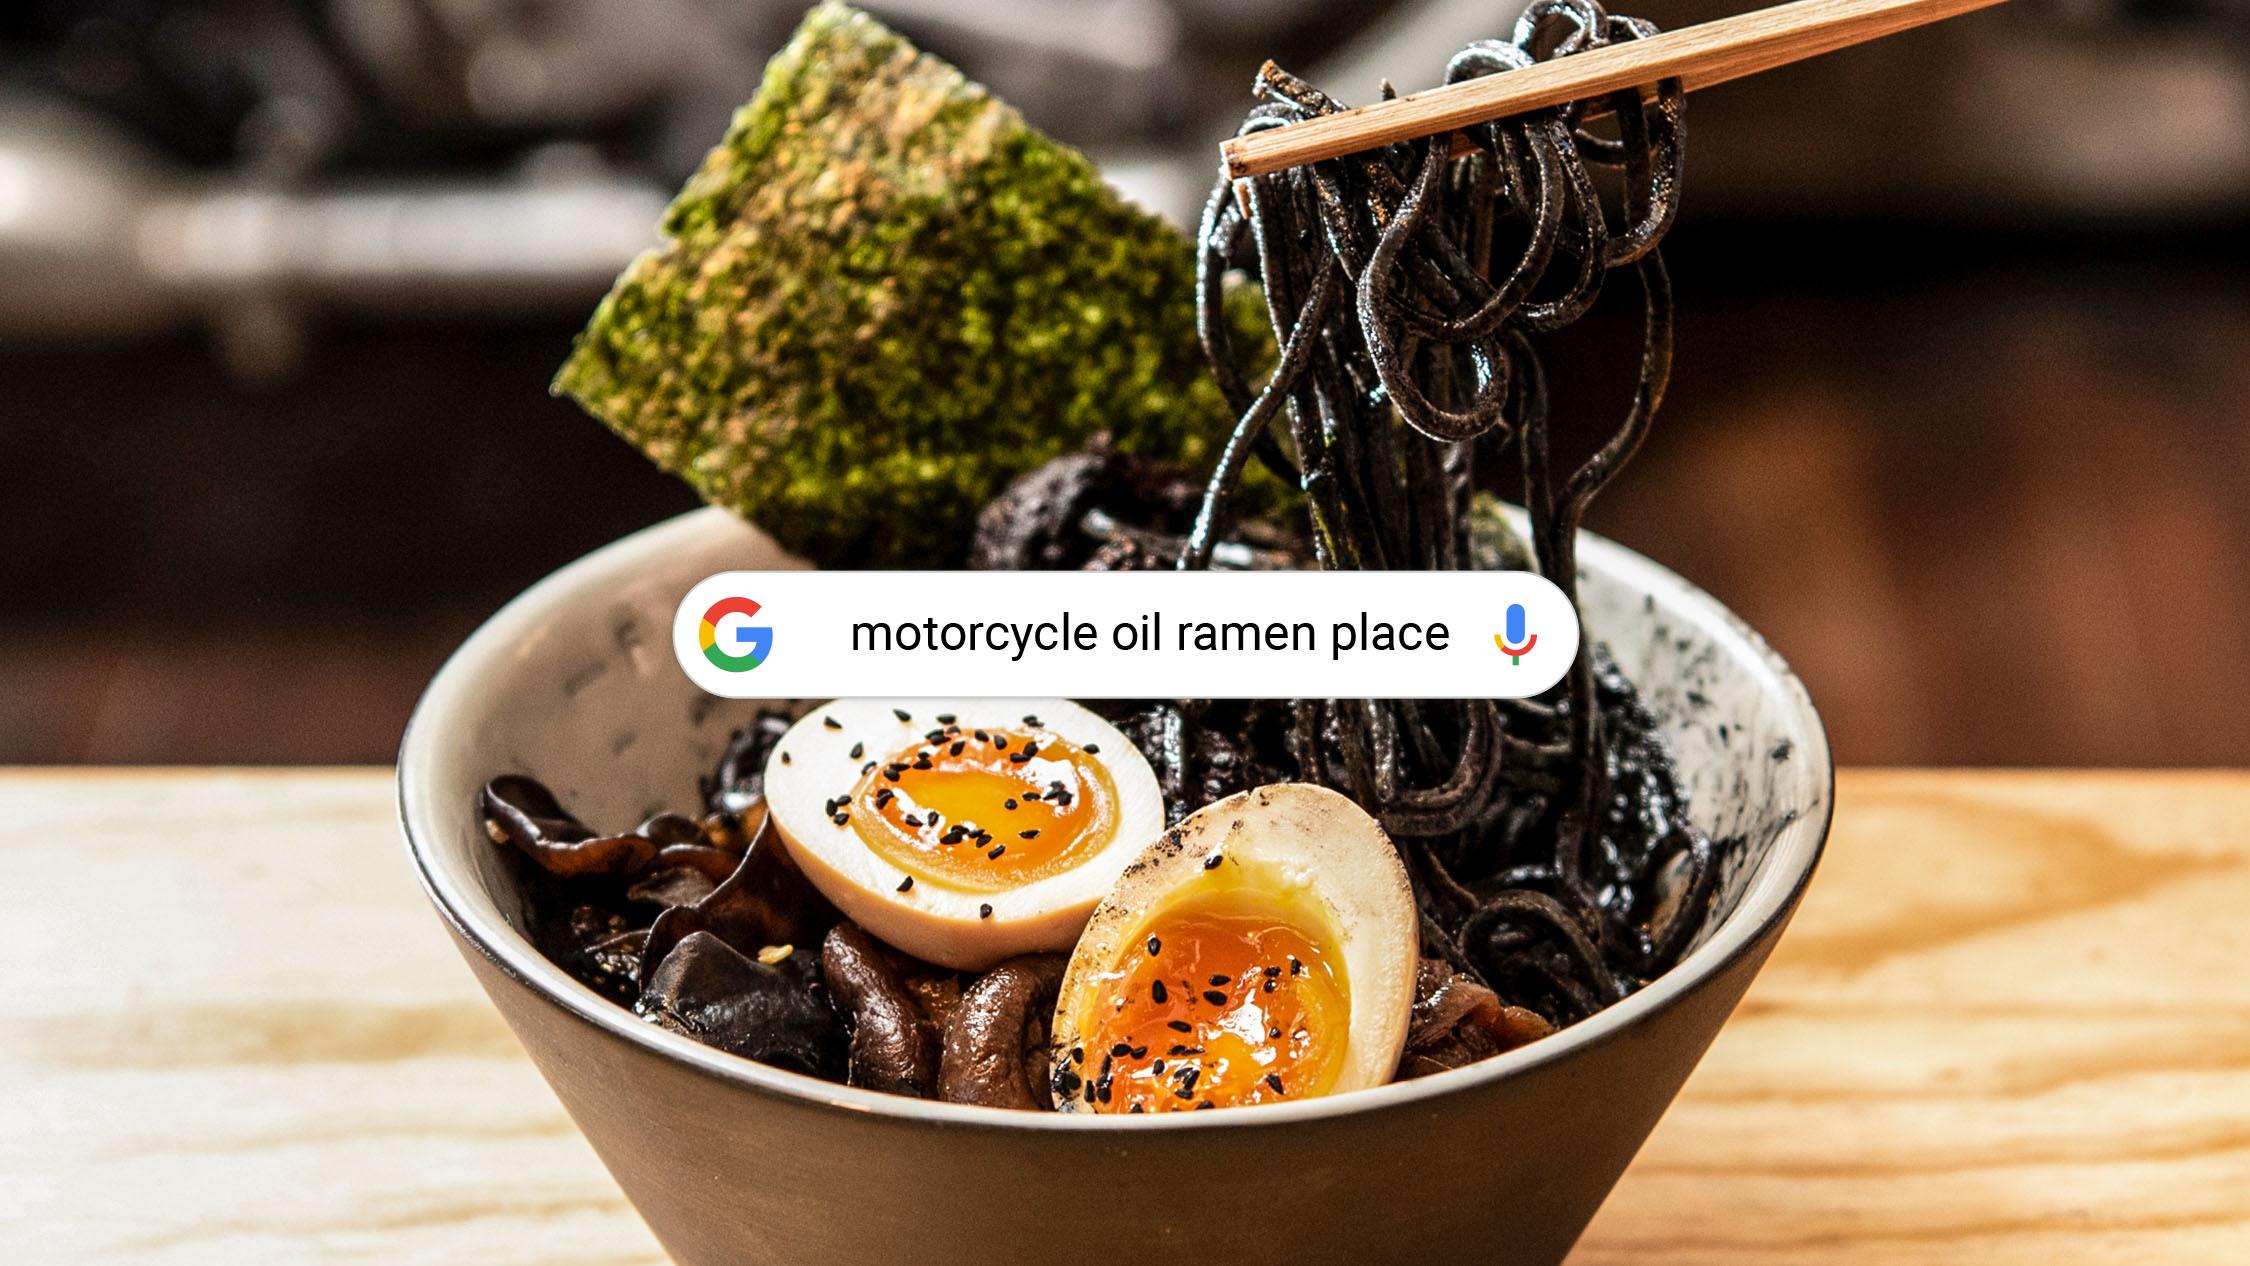 Motorcycle Oil Ramen at Rising Sun Workshop